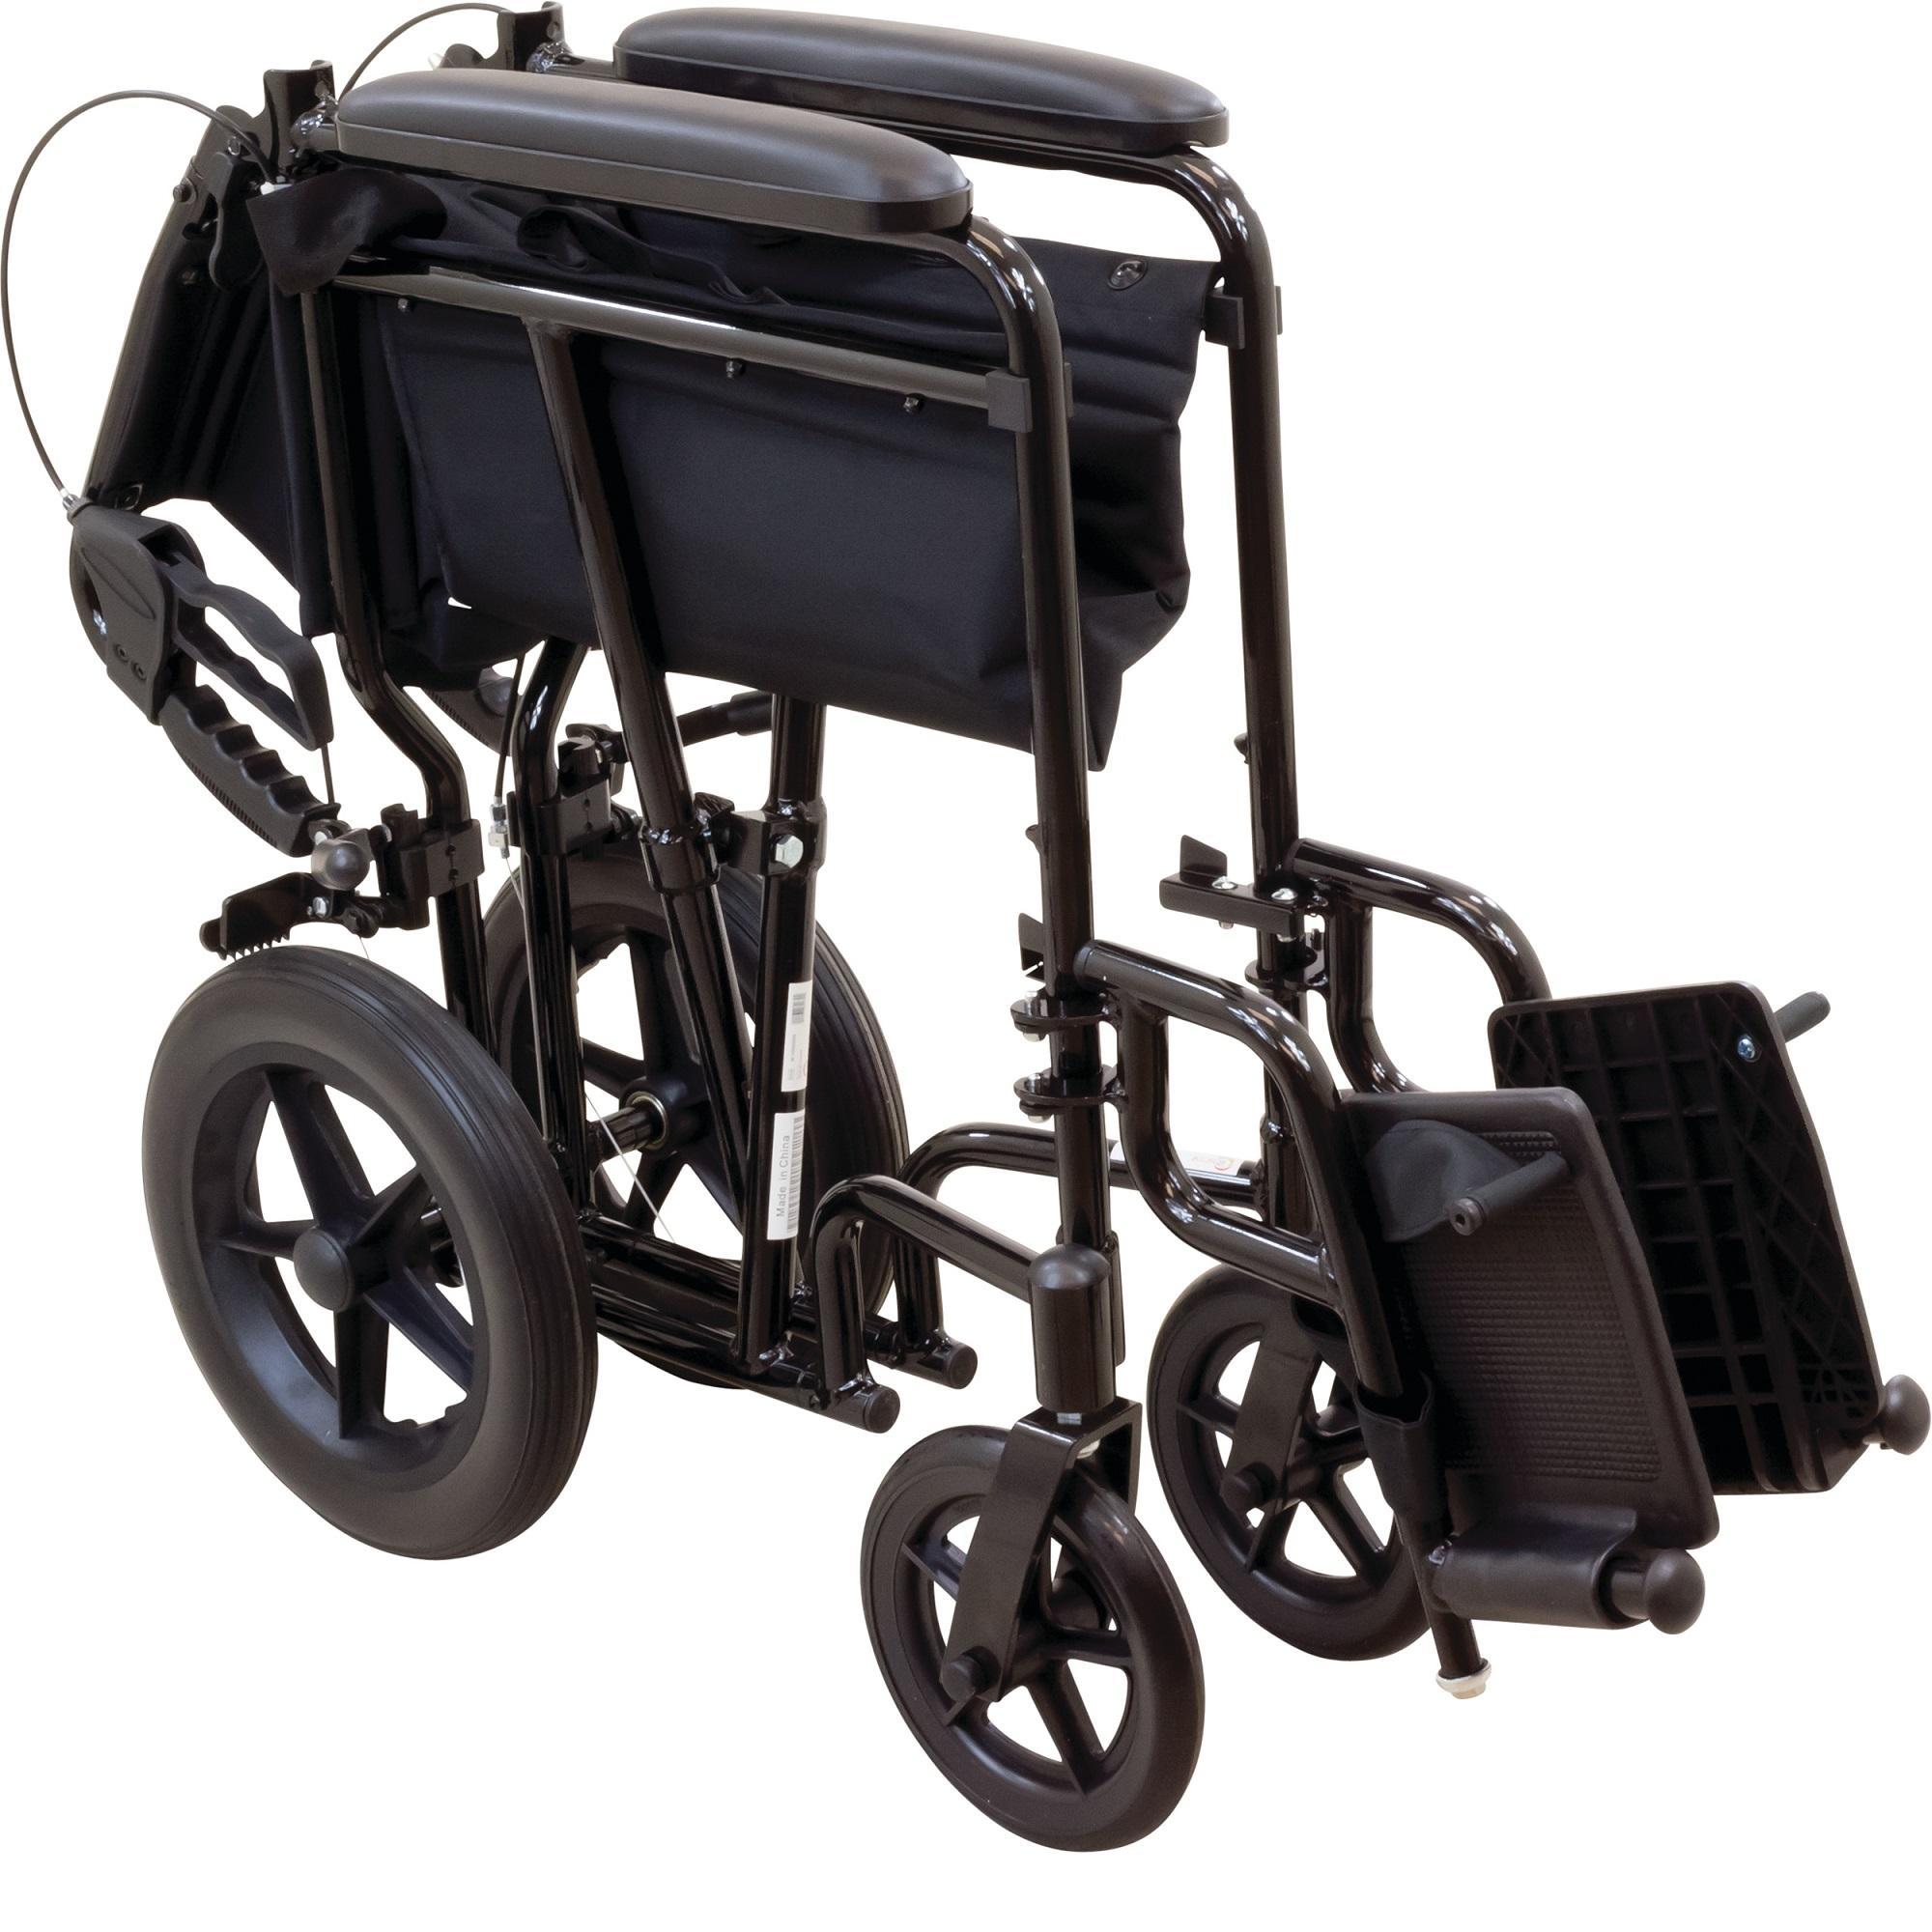 View larger  sc 1 st  Amazon.com & Amazon.com: ProBasics Transport Chair Wheelchair Aluminum 19 ... islam-shia.org